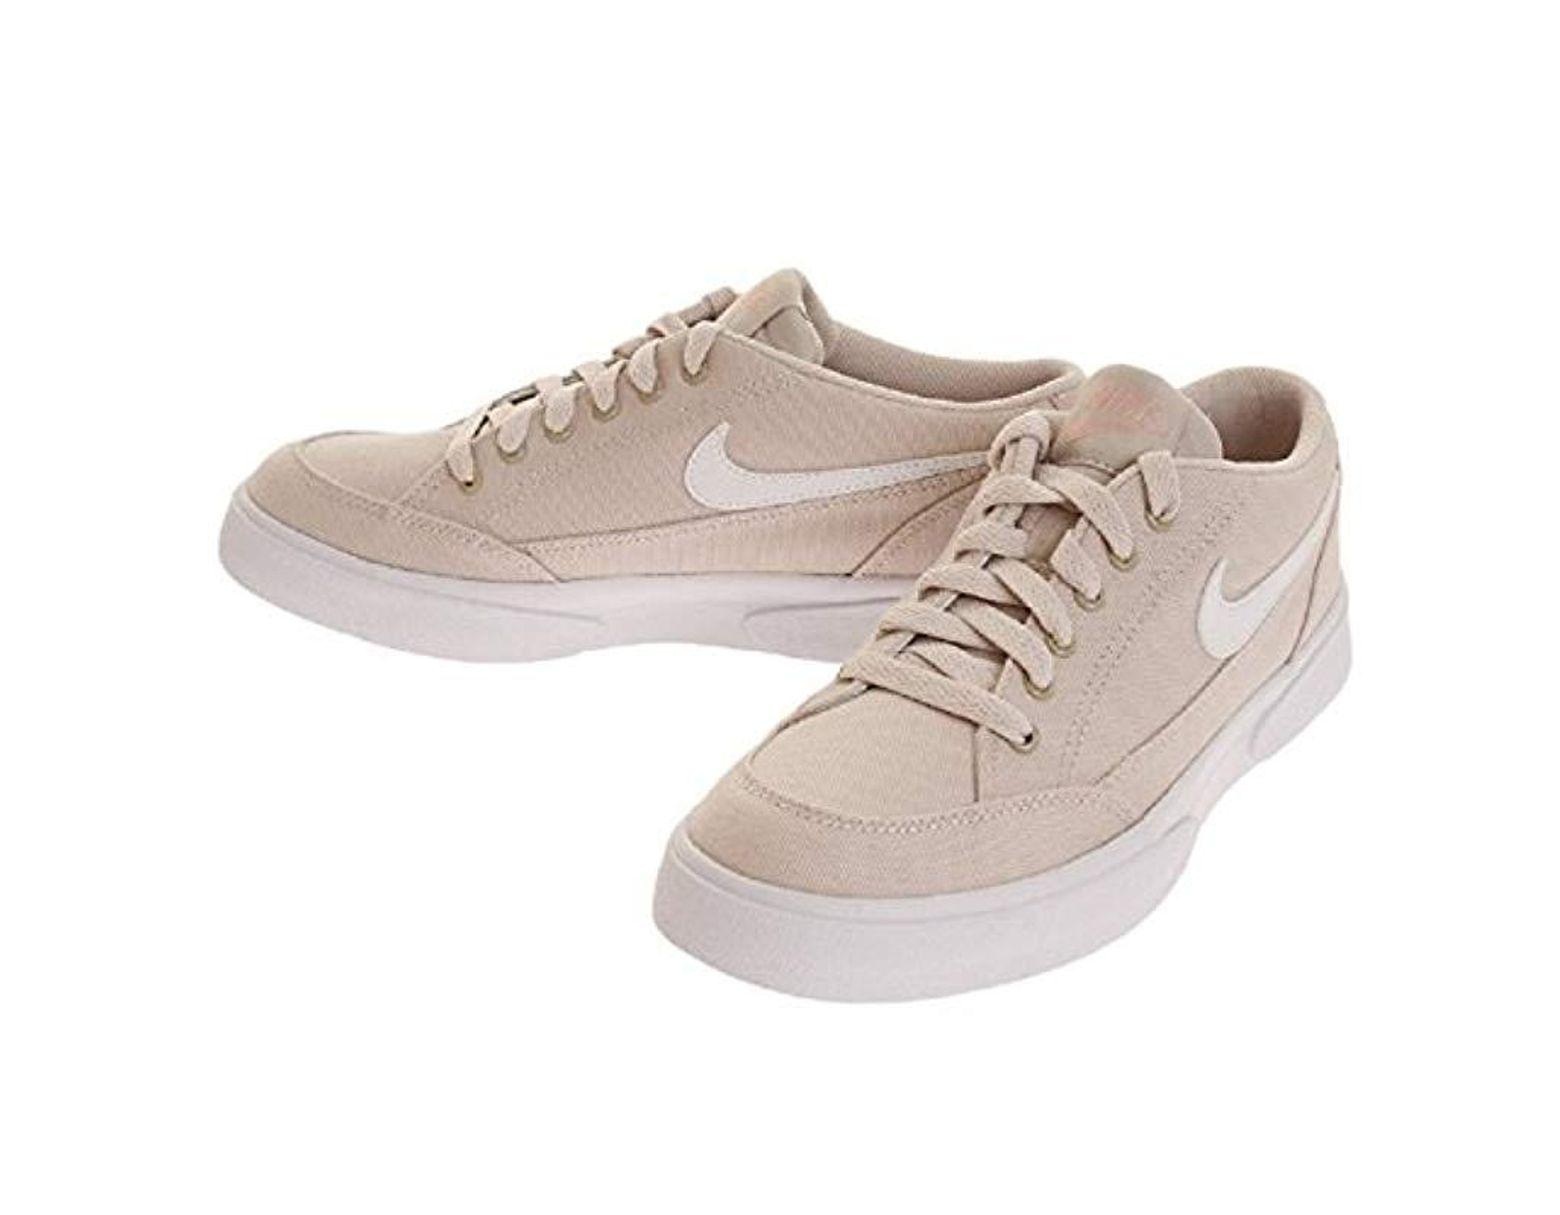 519f6d37febe4 Nike Gts 16 Txt Fashion Sneakers Desert Sand Pink - Lyst